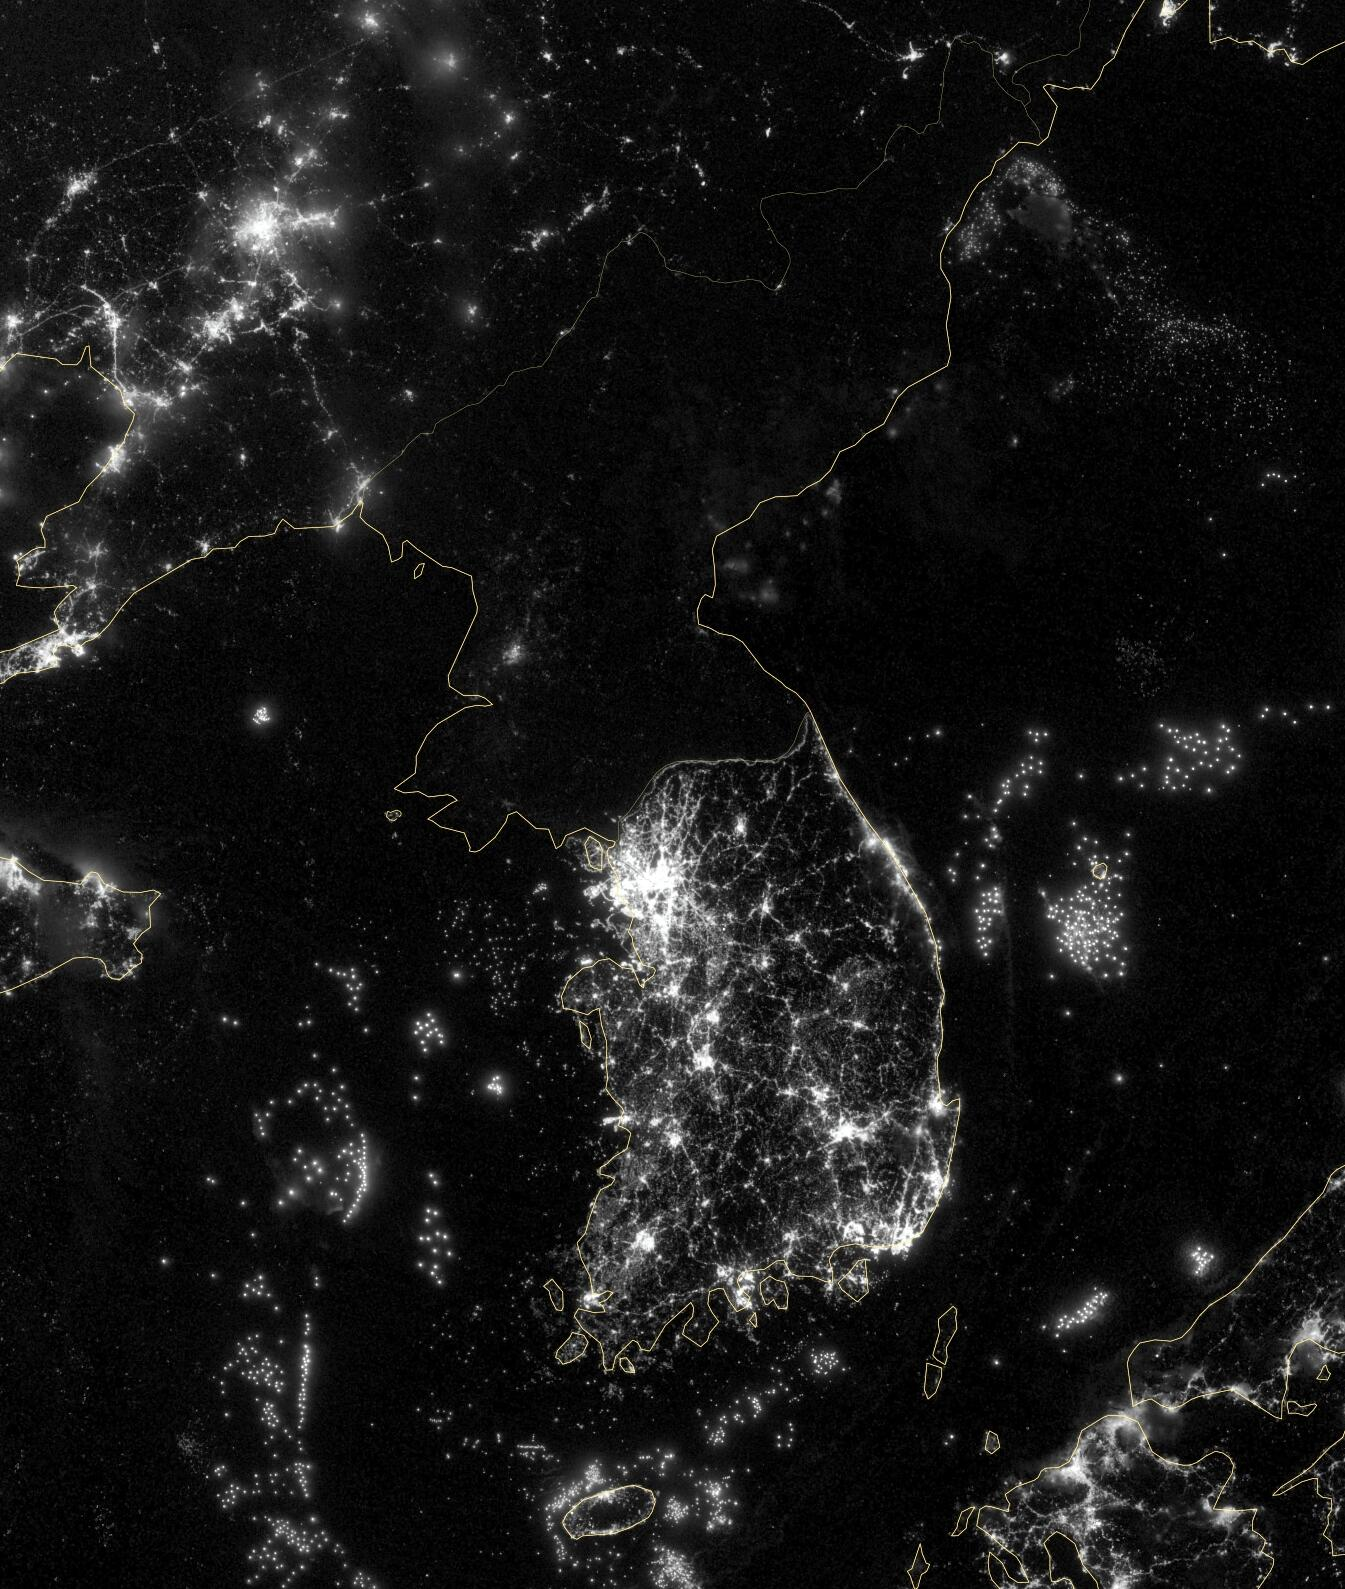 Северная корея фото со спутника